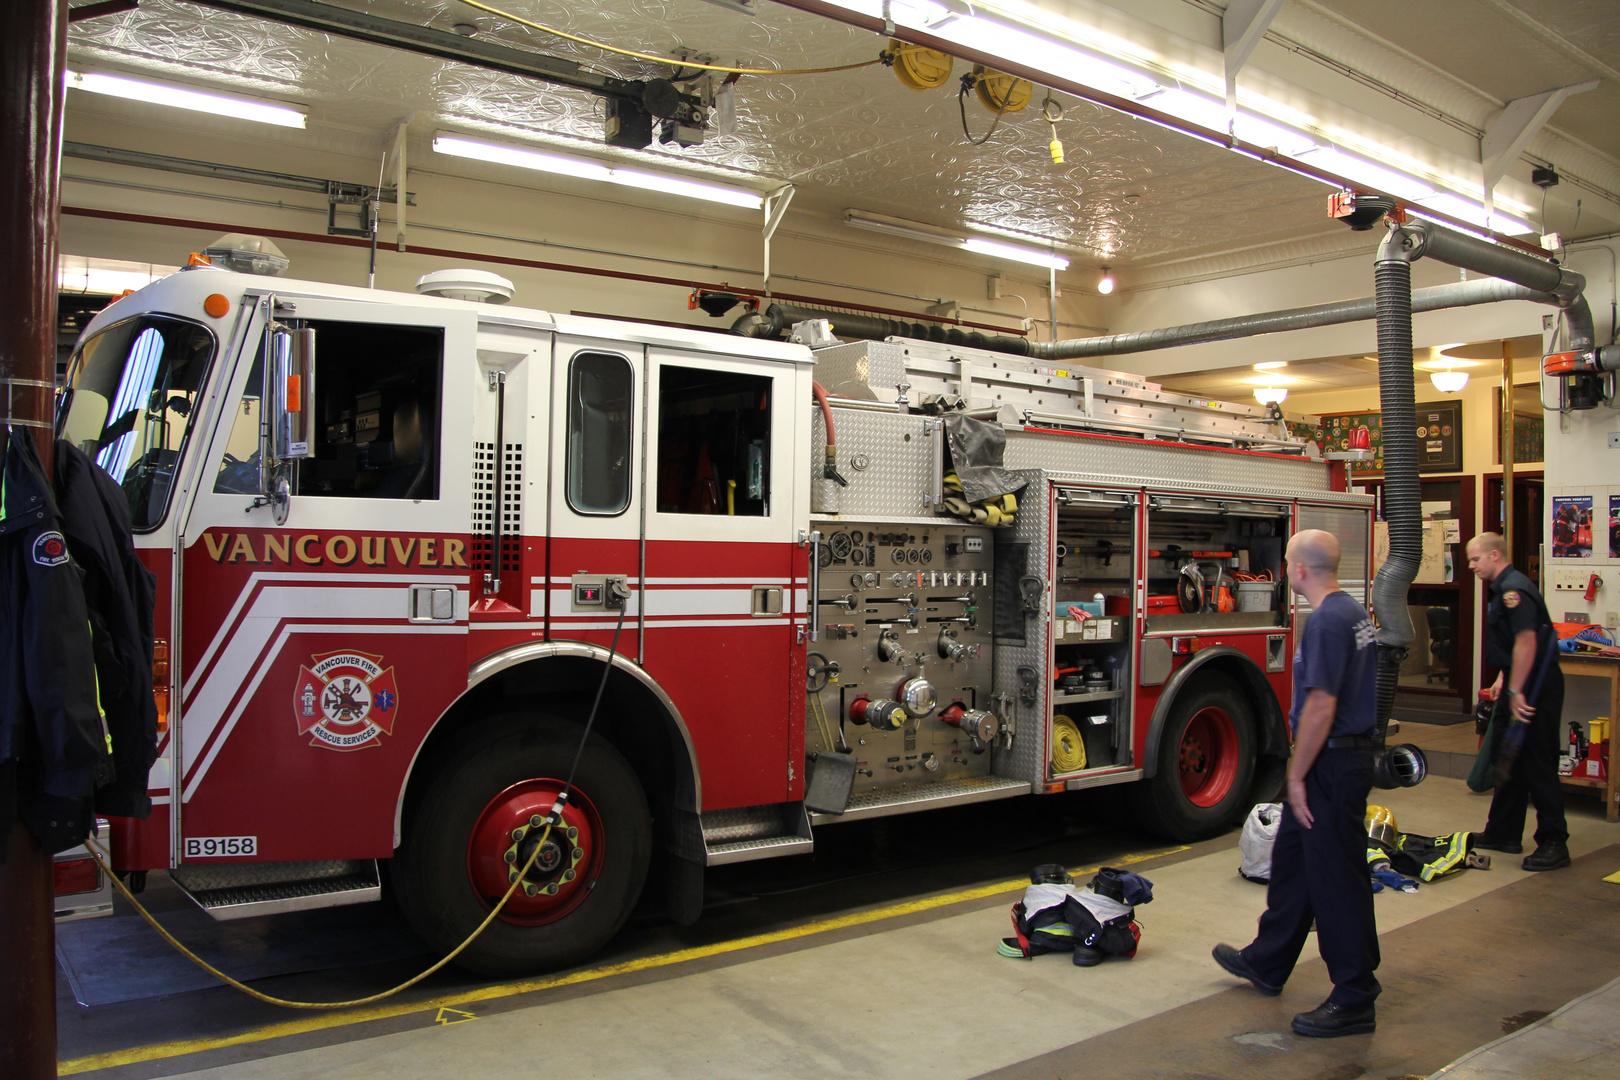 Firefighting Truck # B9158